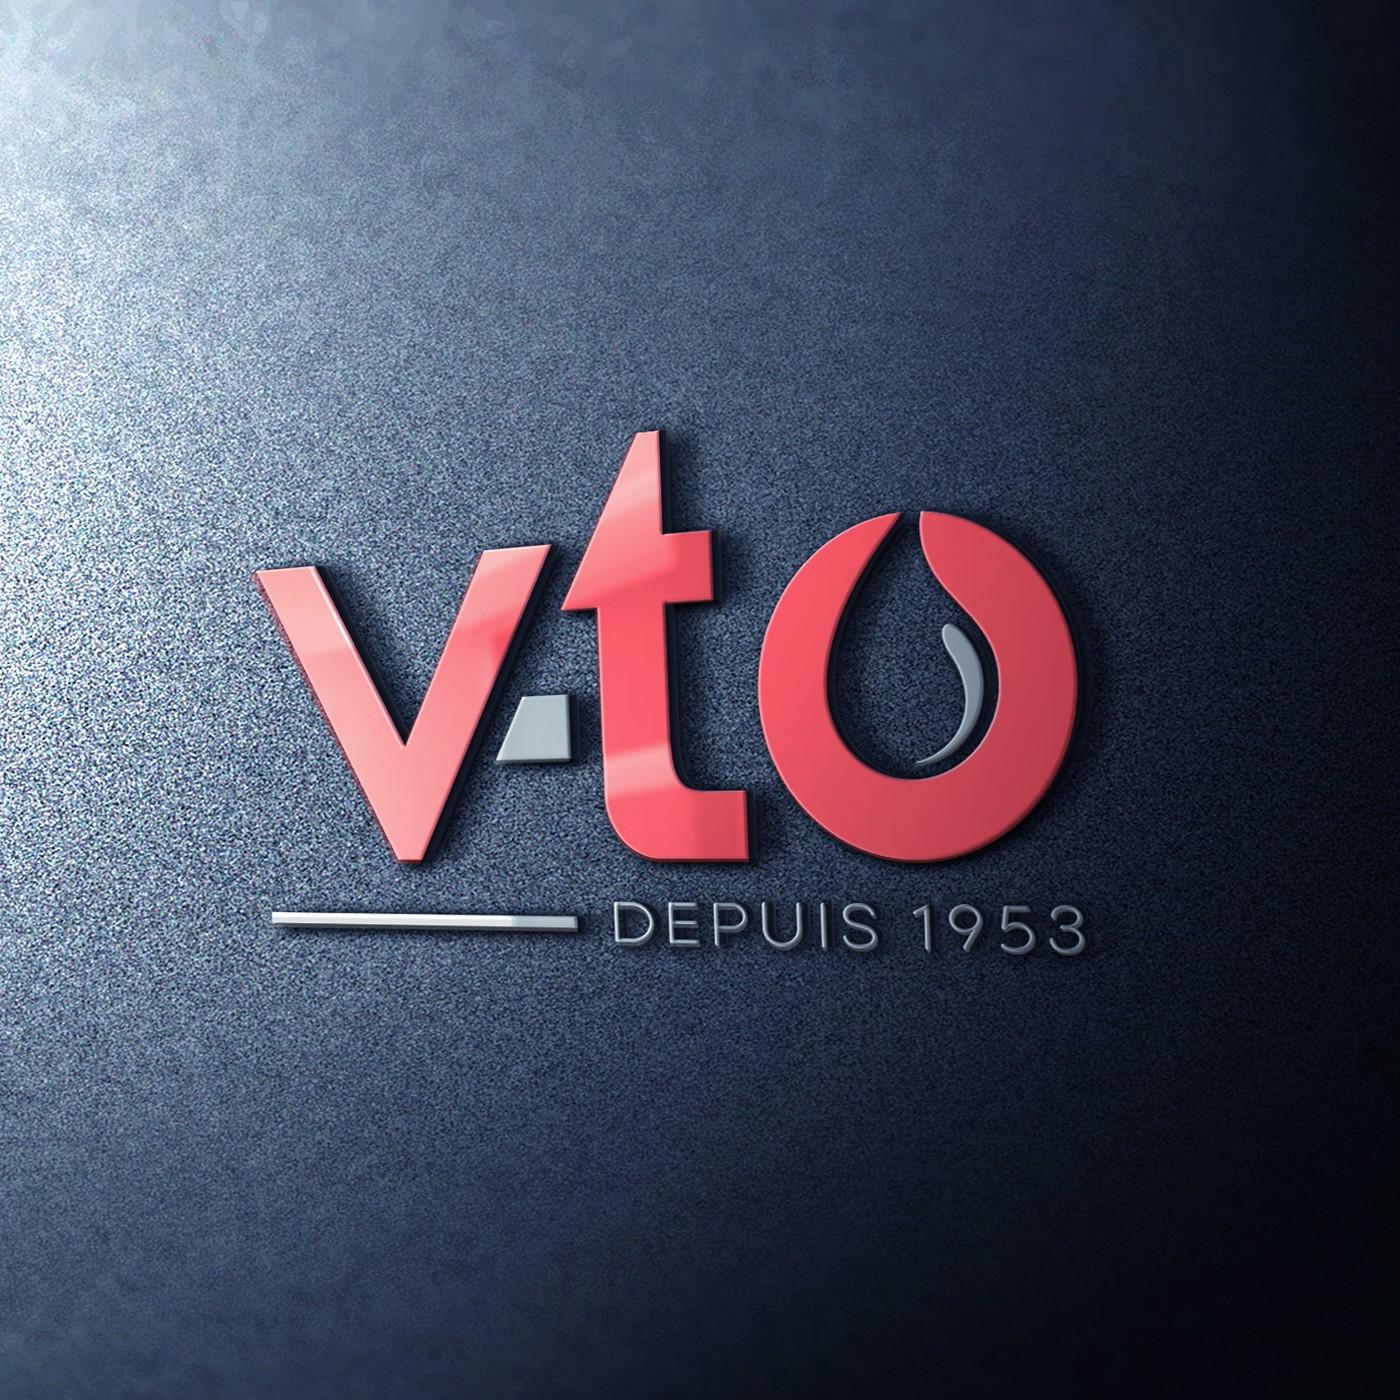 V-TO would like to modernize is logo